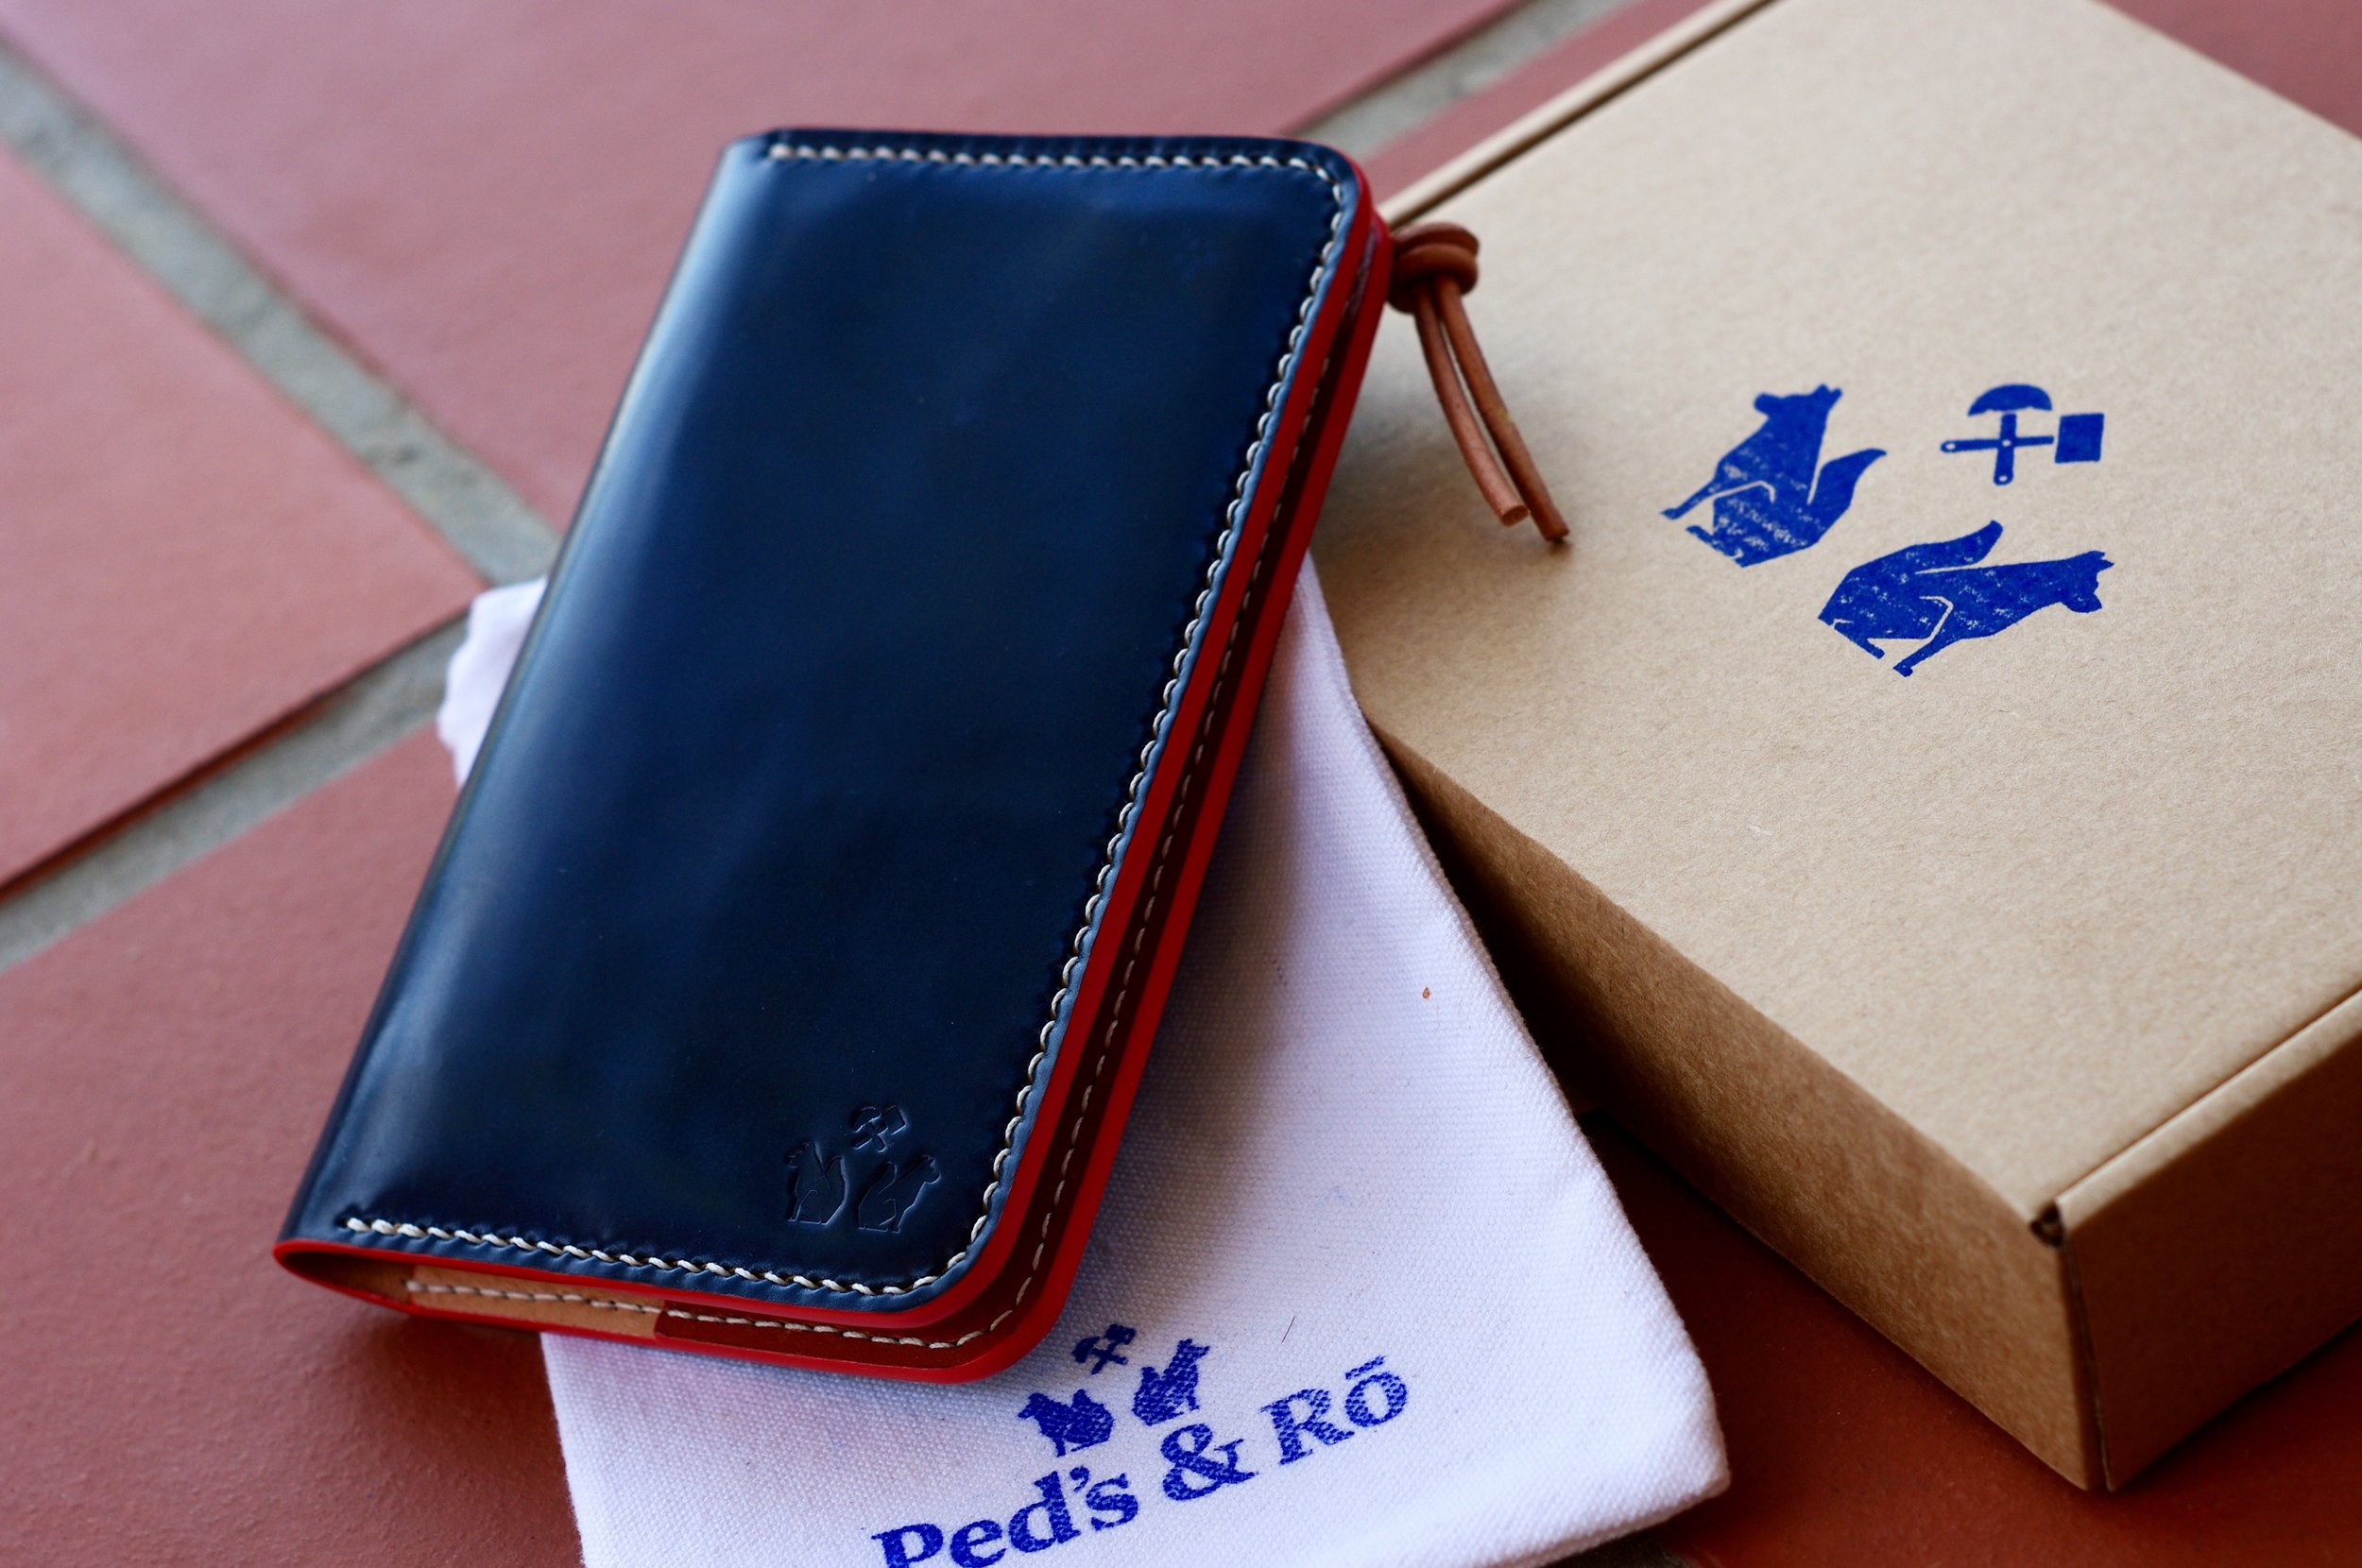 Andre Wallet Finish - Packaging.jpg